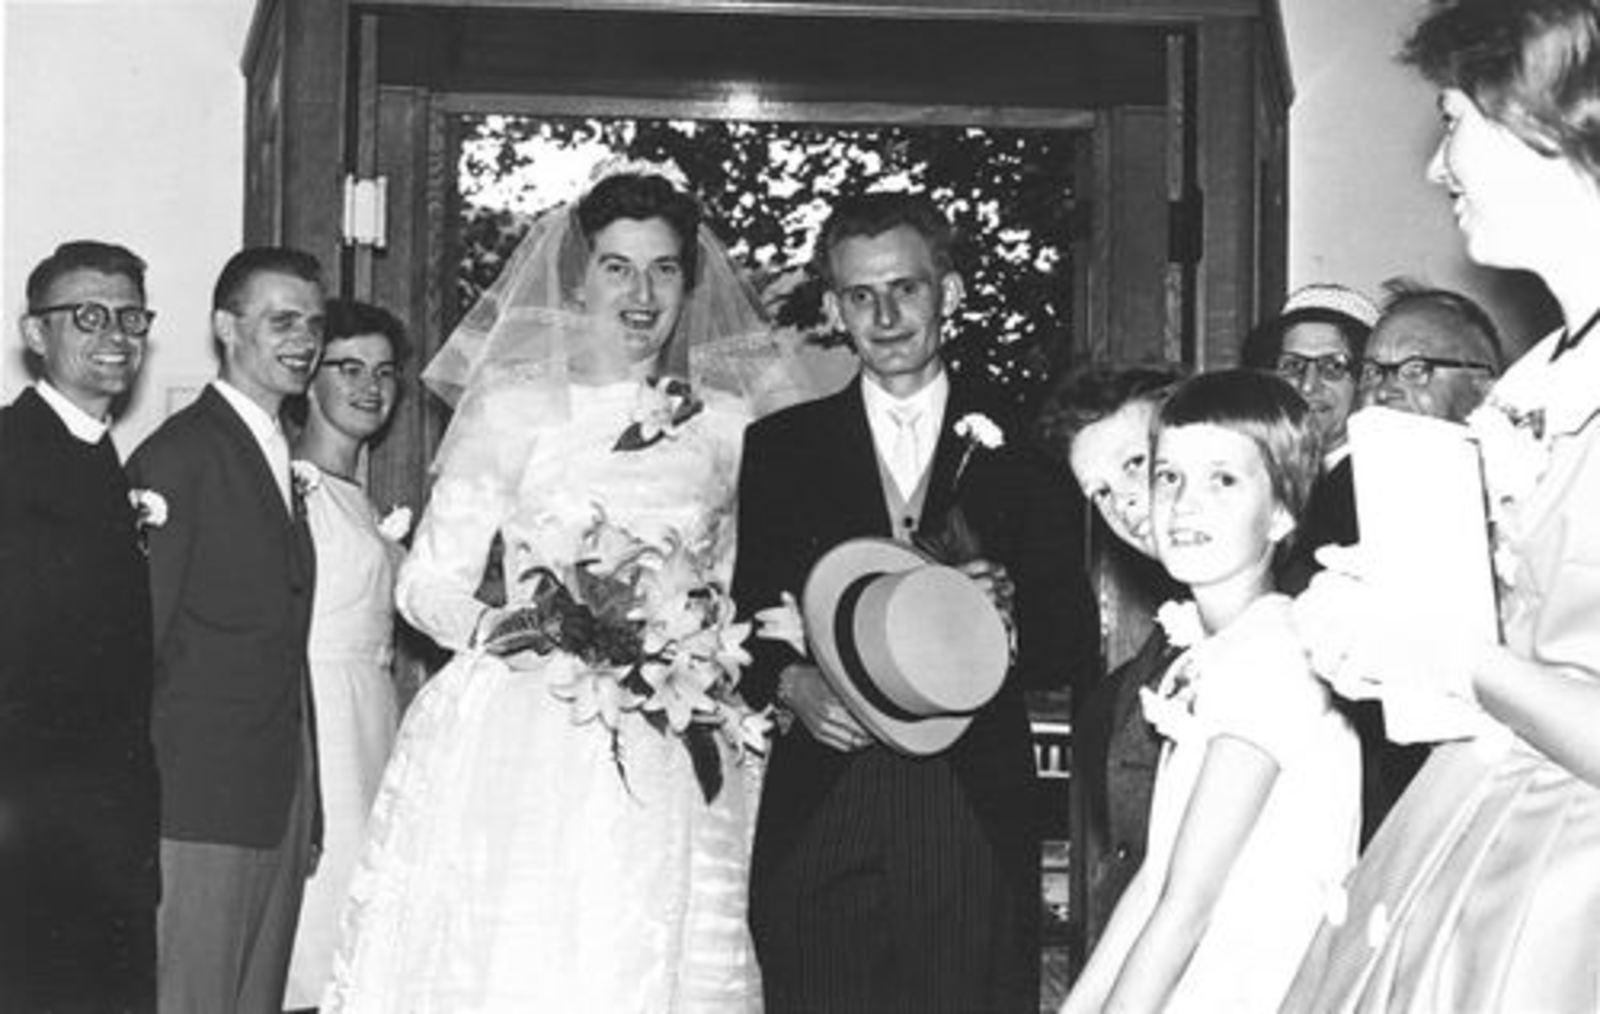 Dam Johanna M 1935 19__ trouwt Jacobus Bonte 03